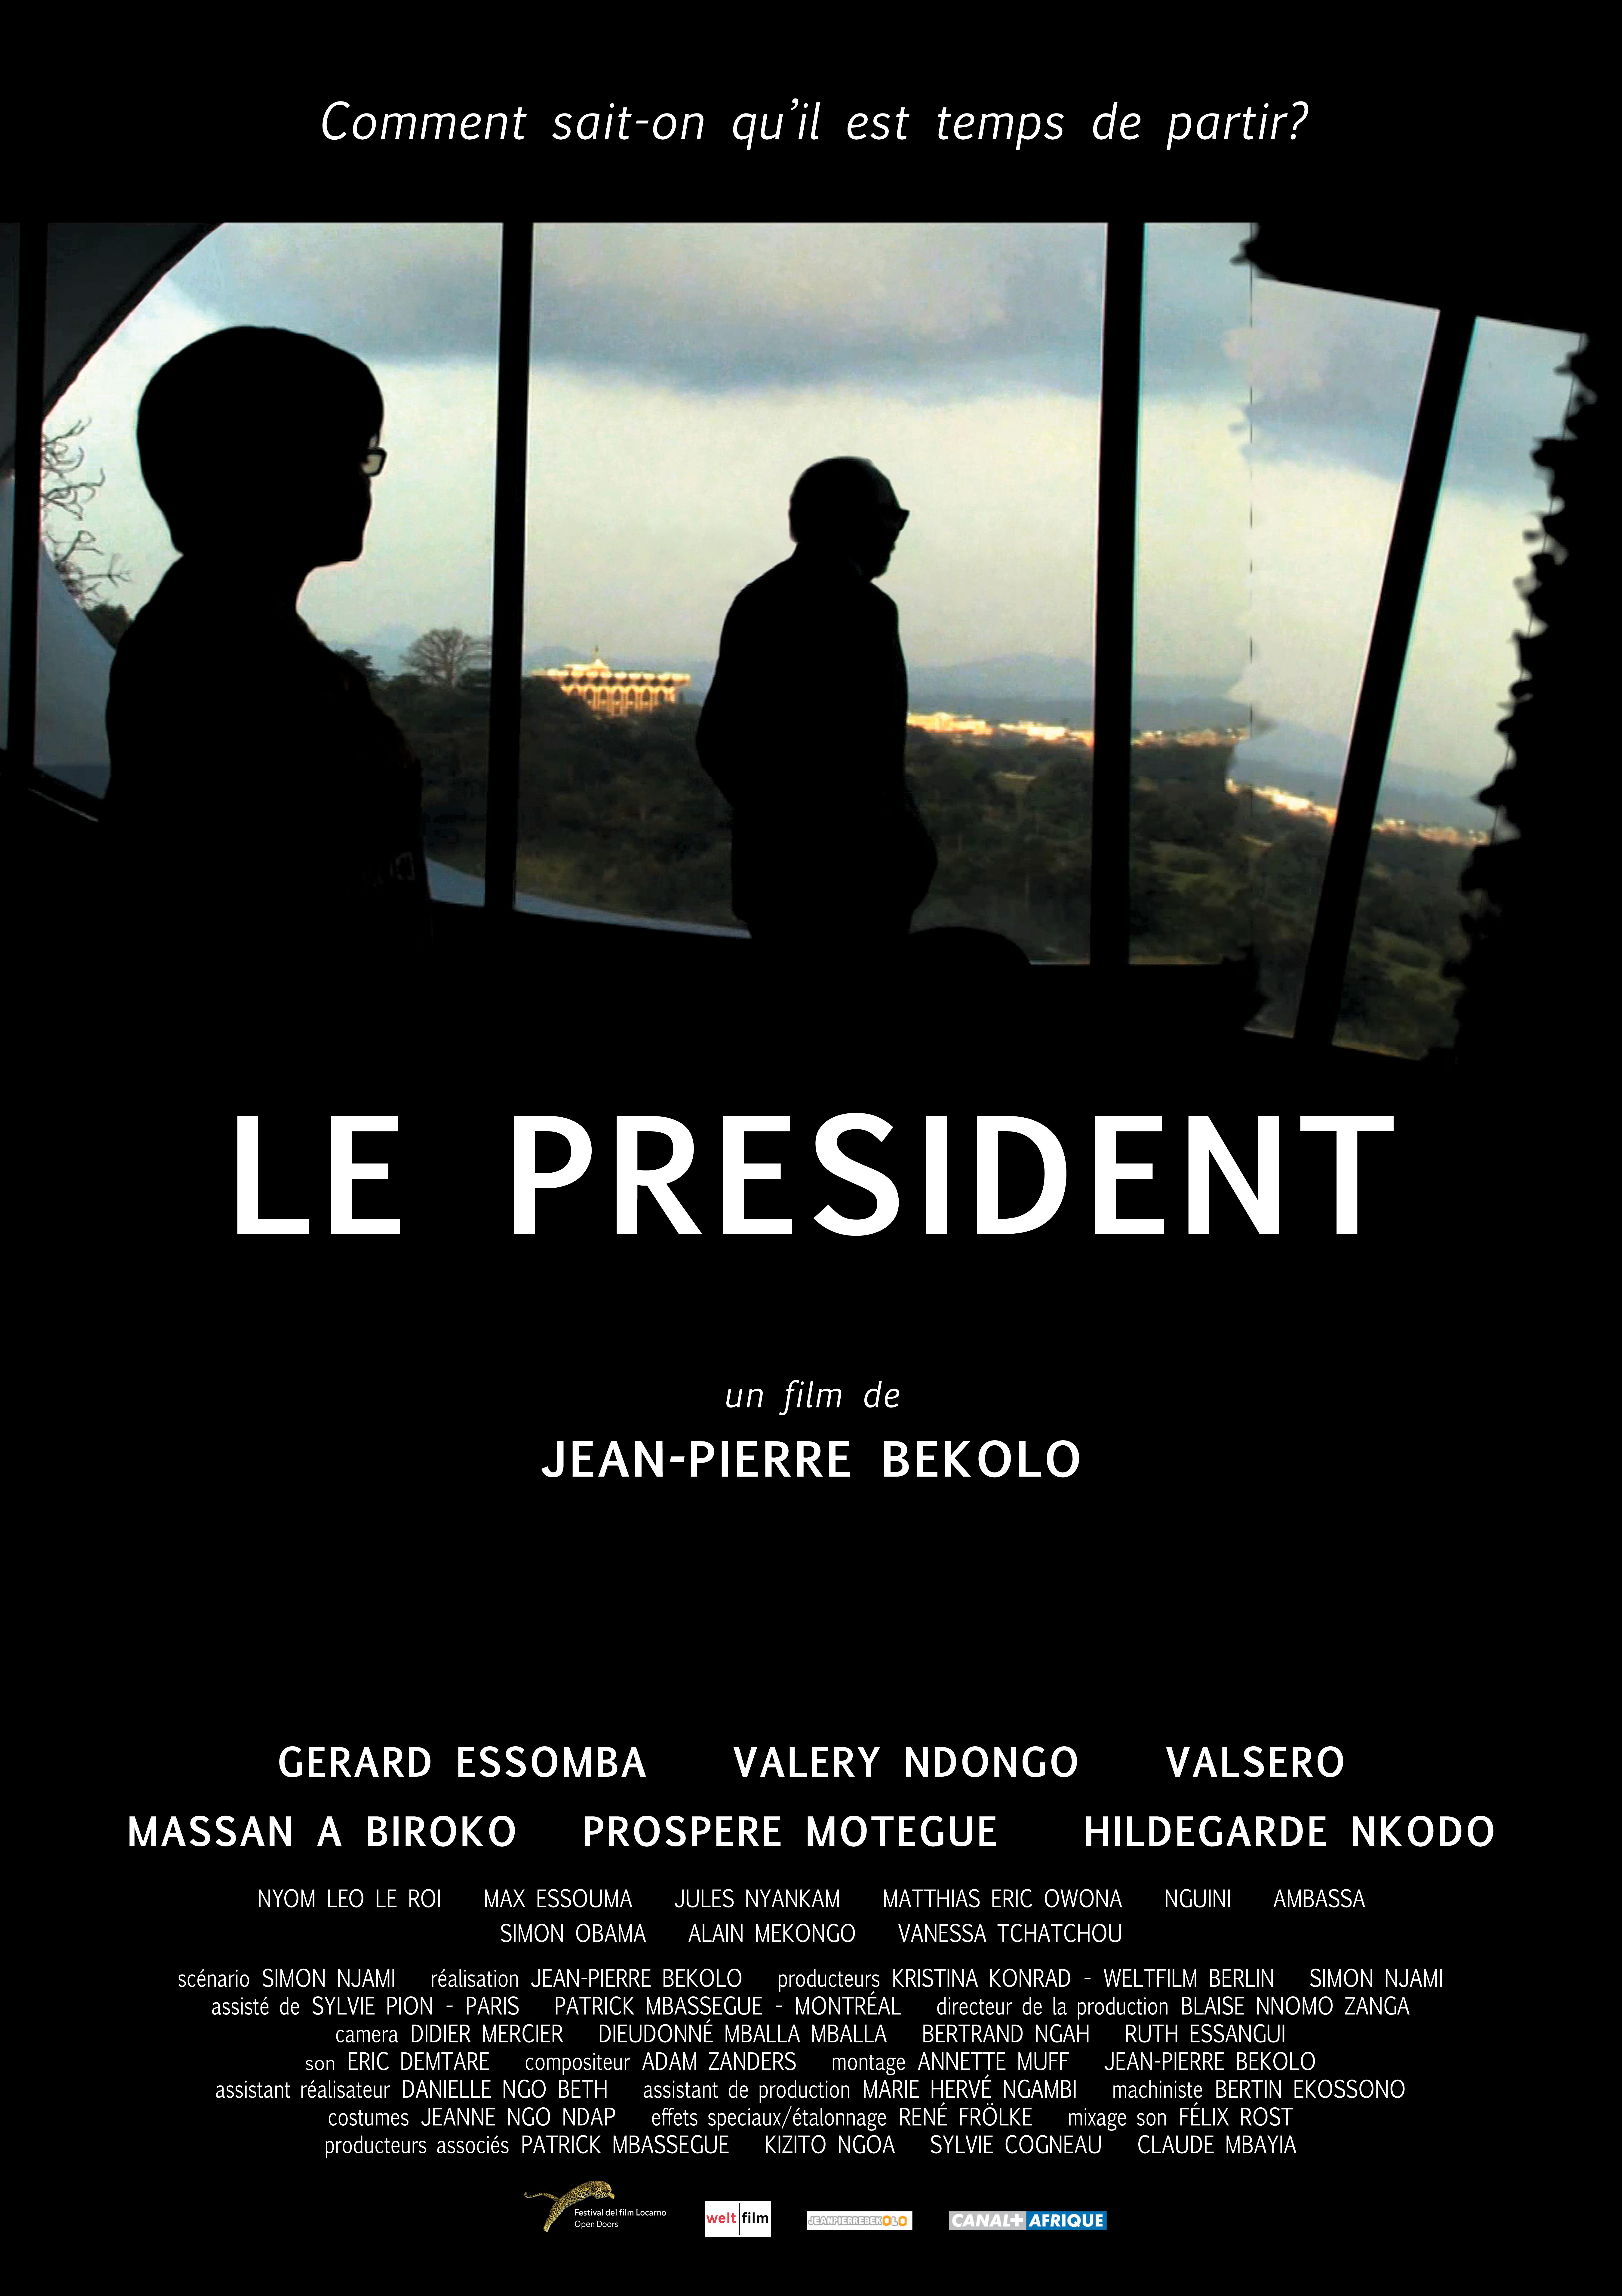 Le President